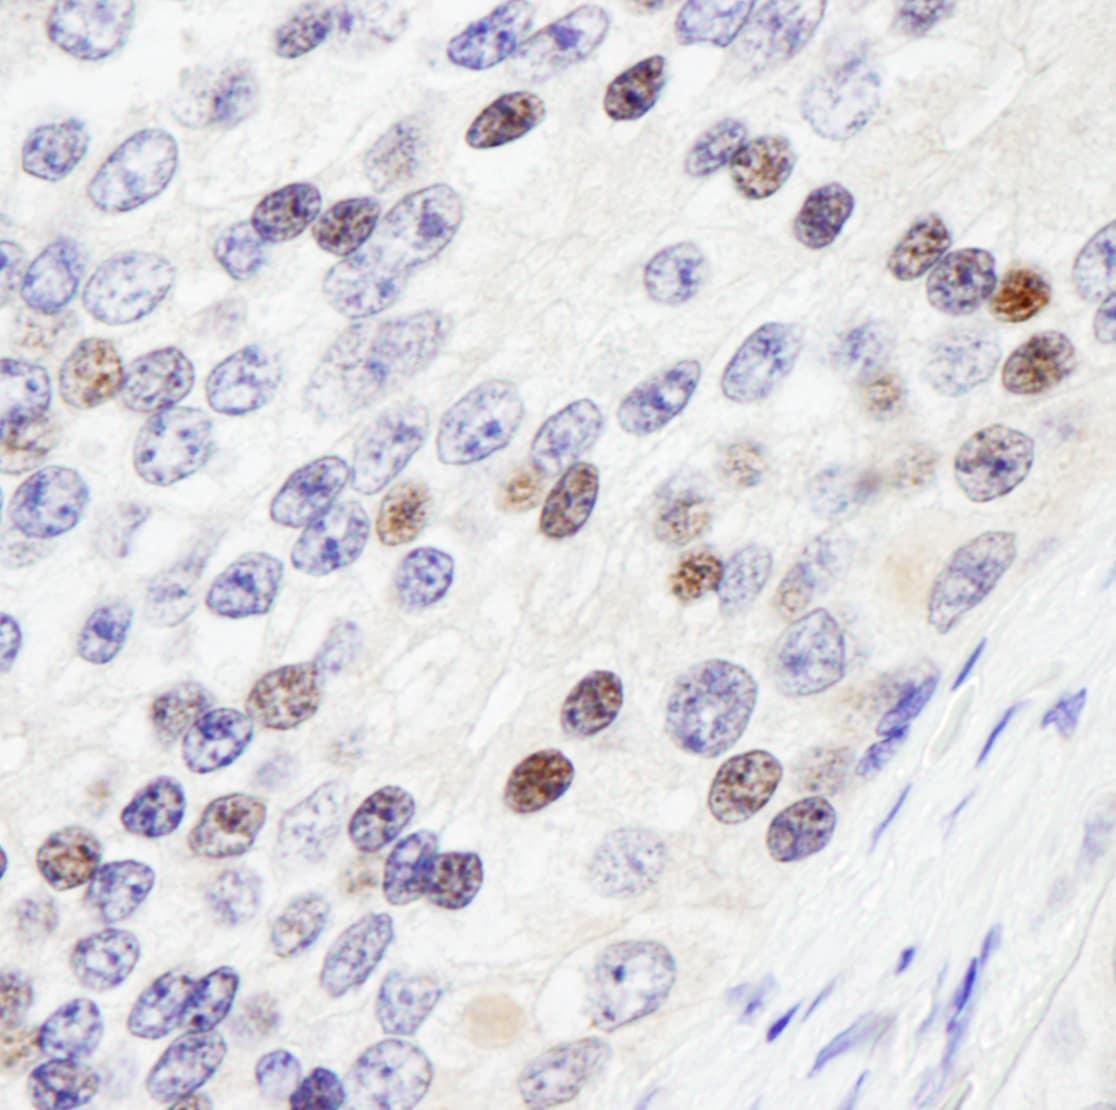 ZHX3 Antibody in Immunohistochemistry (IHC)